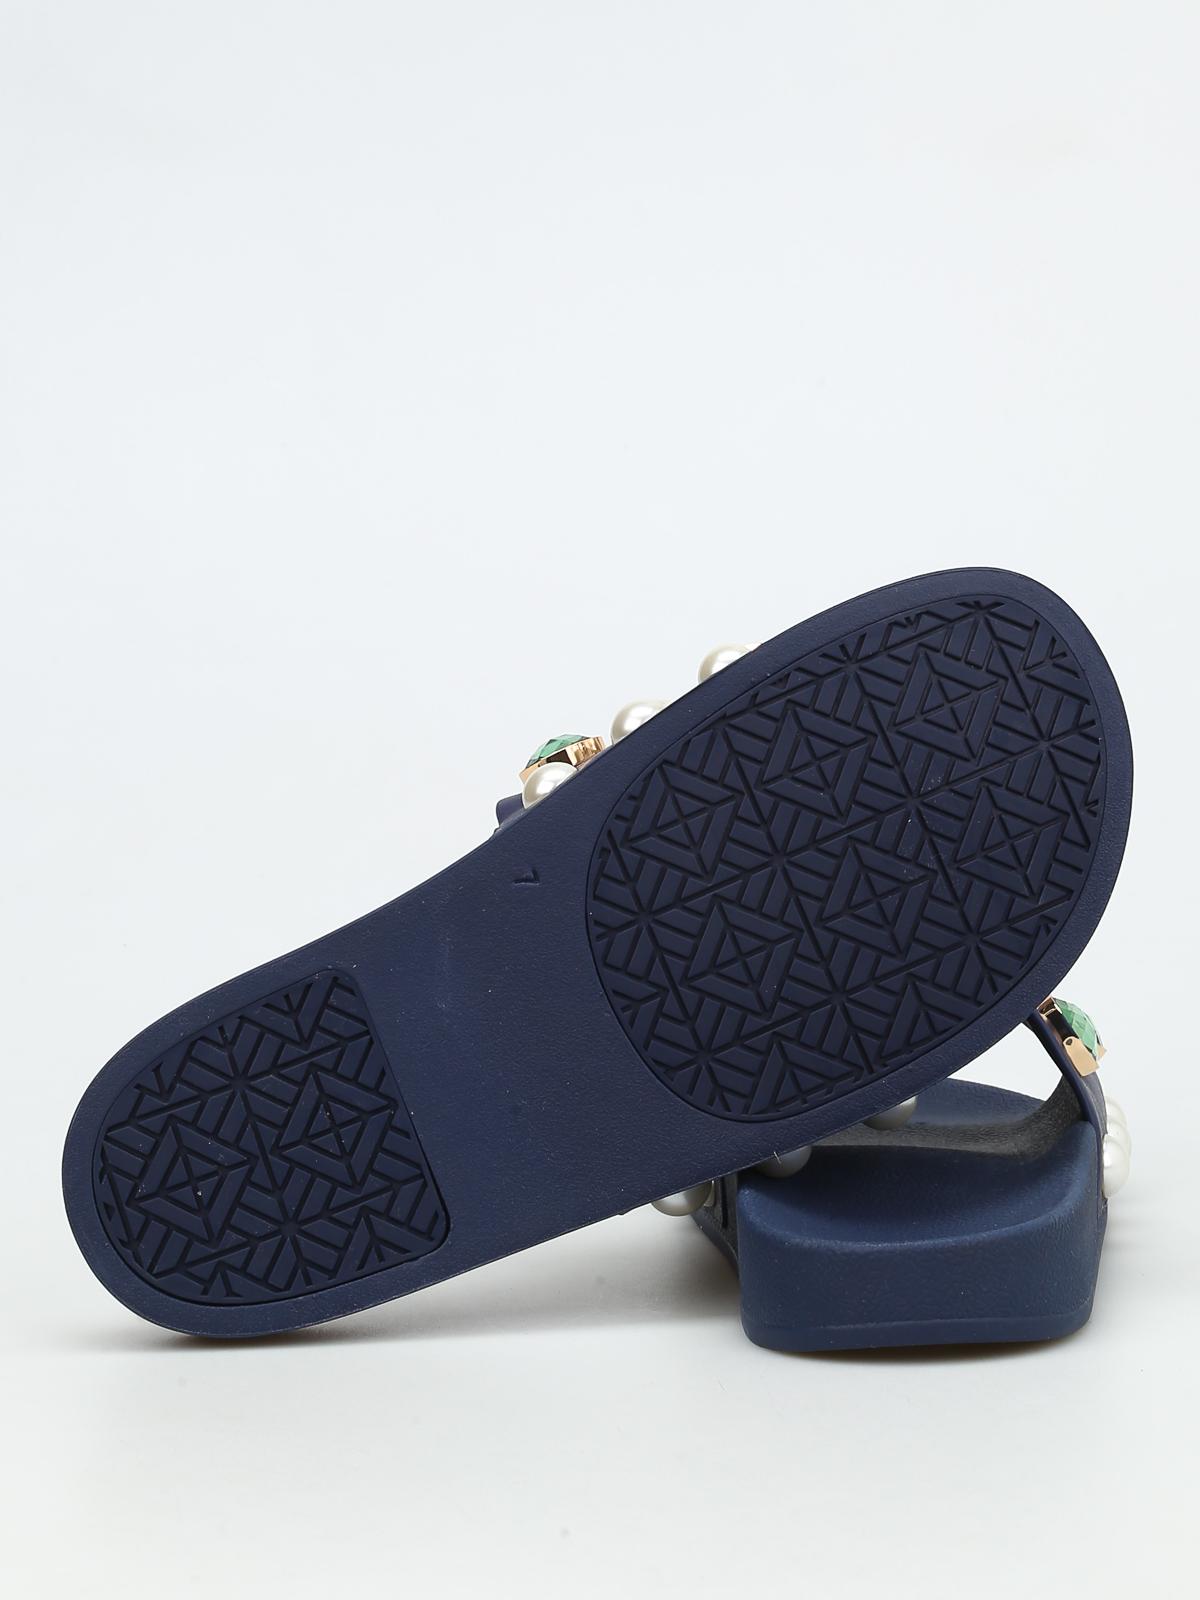 ea2ac89f0555f Tory Burch - Vail rhinestone and bead sliders - sandals - 35939458